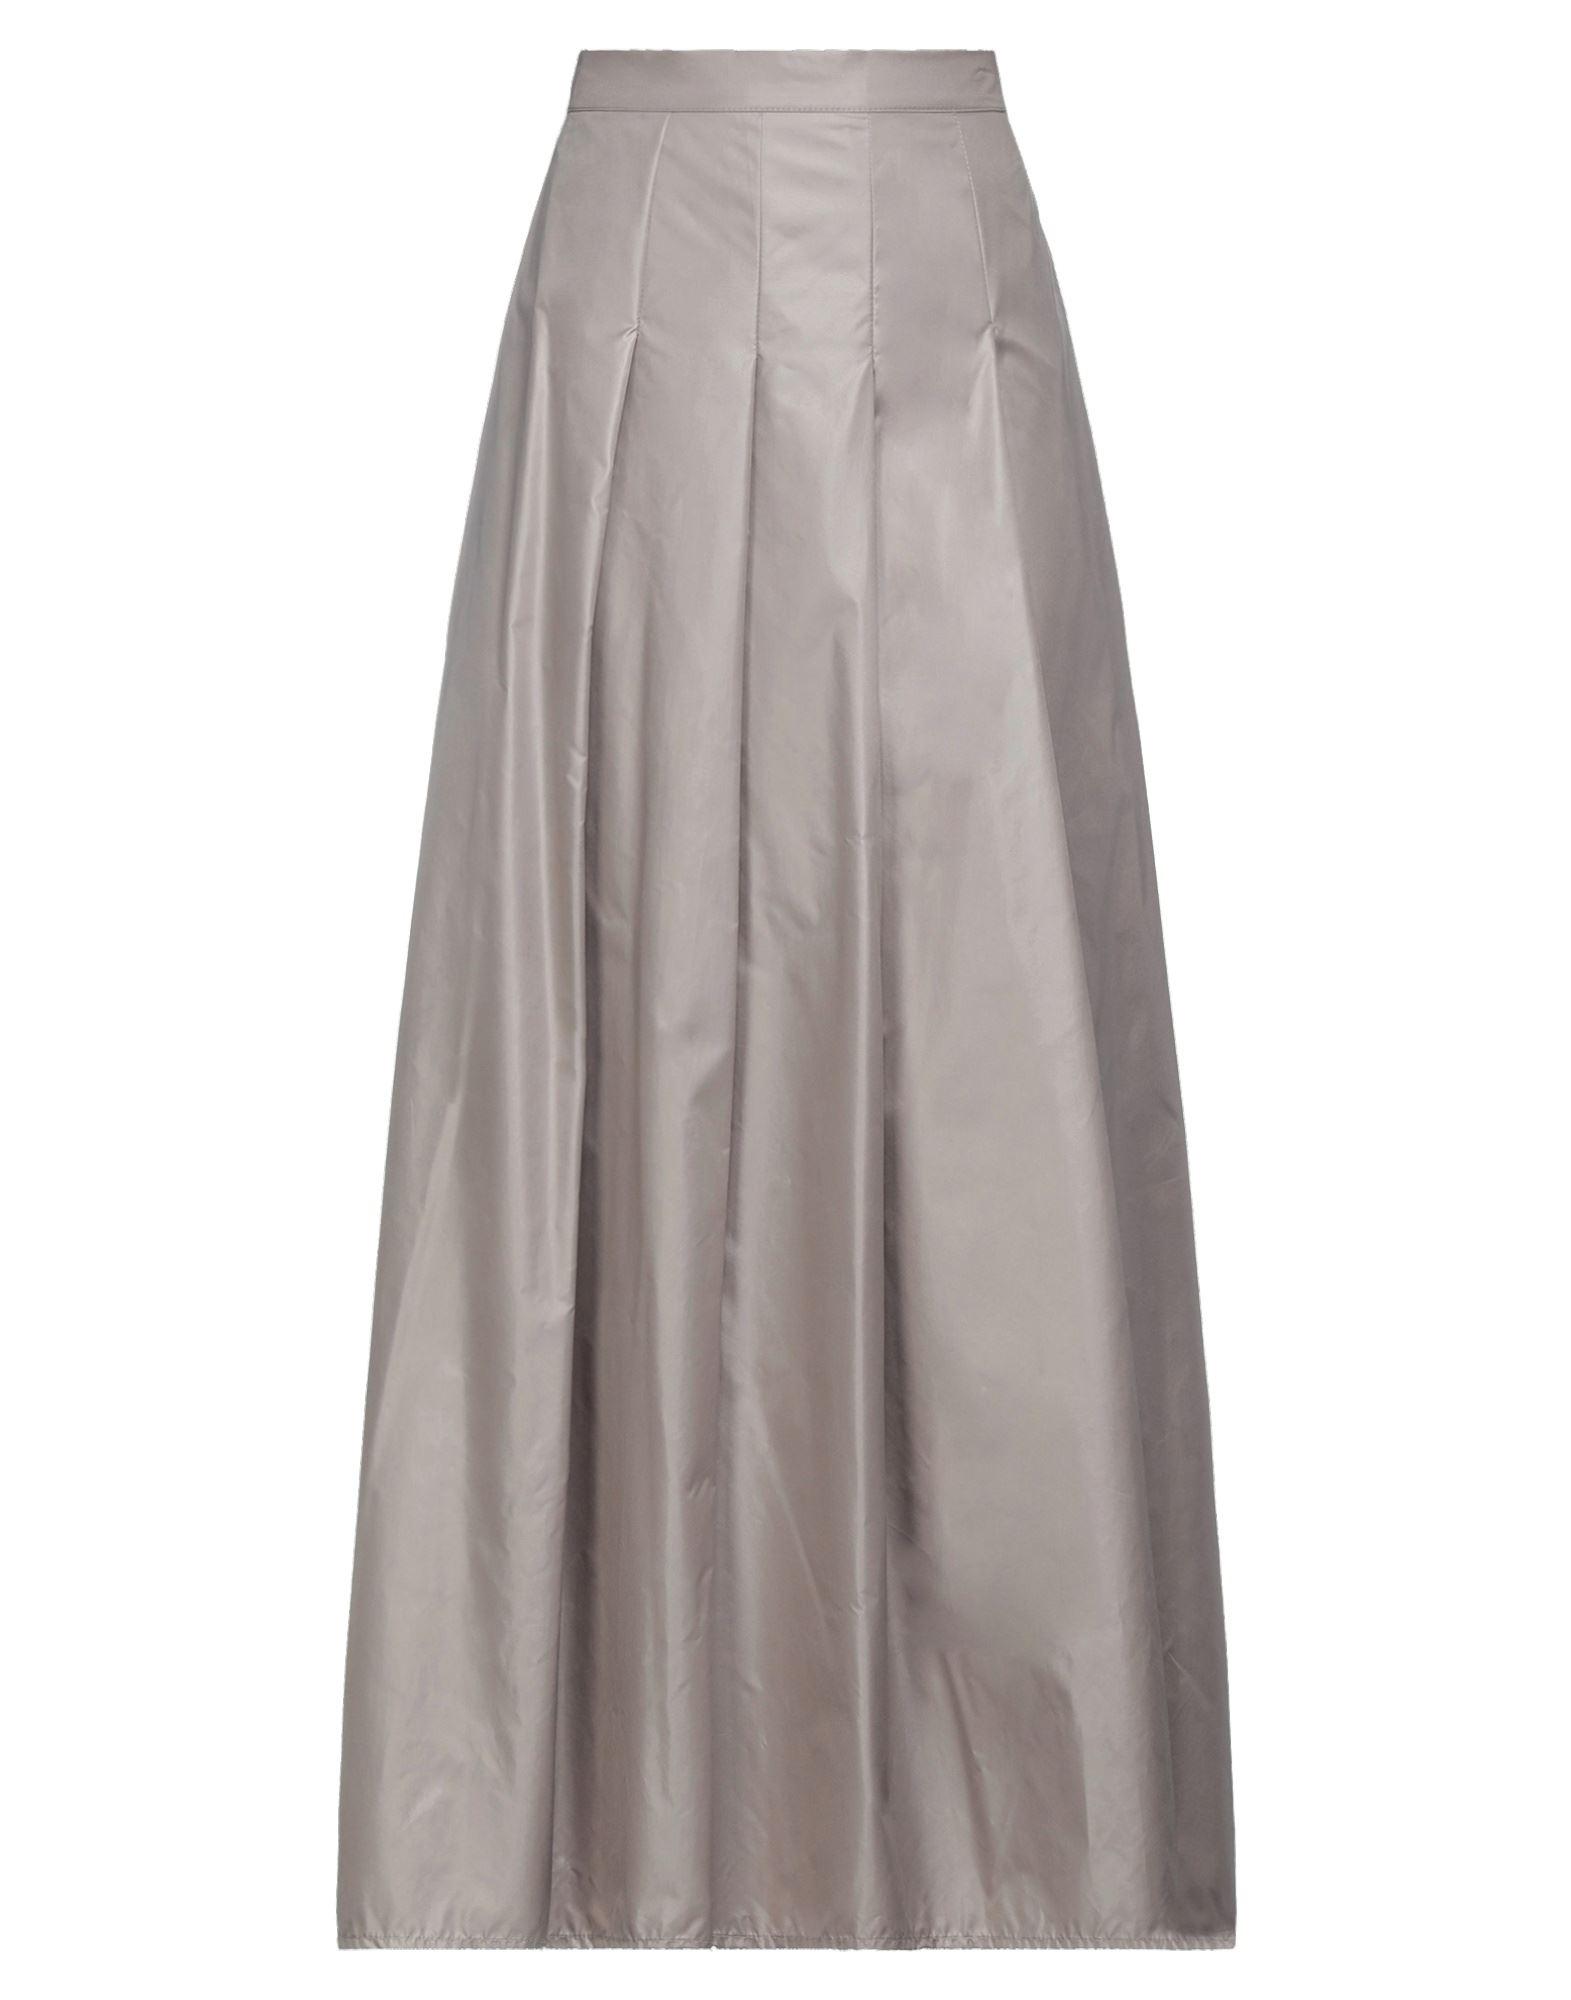 TRICOT CHIC Длинная юбка tricot chic легинсы